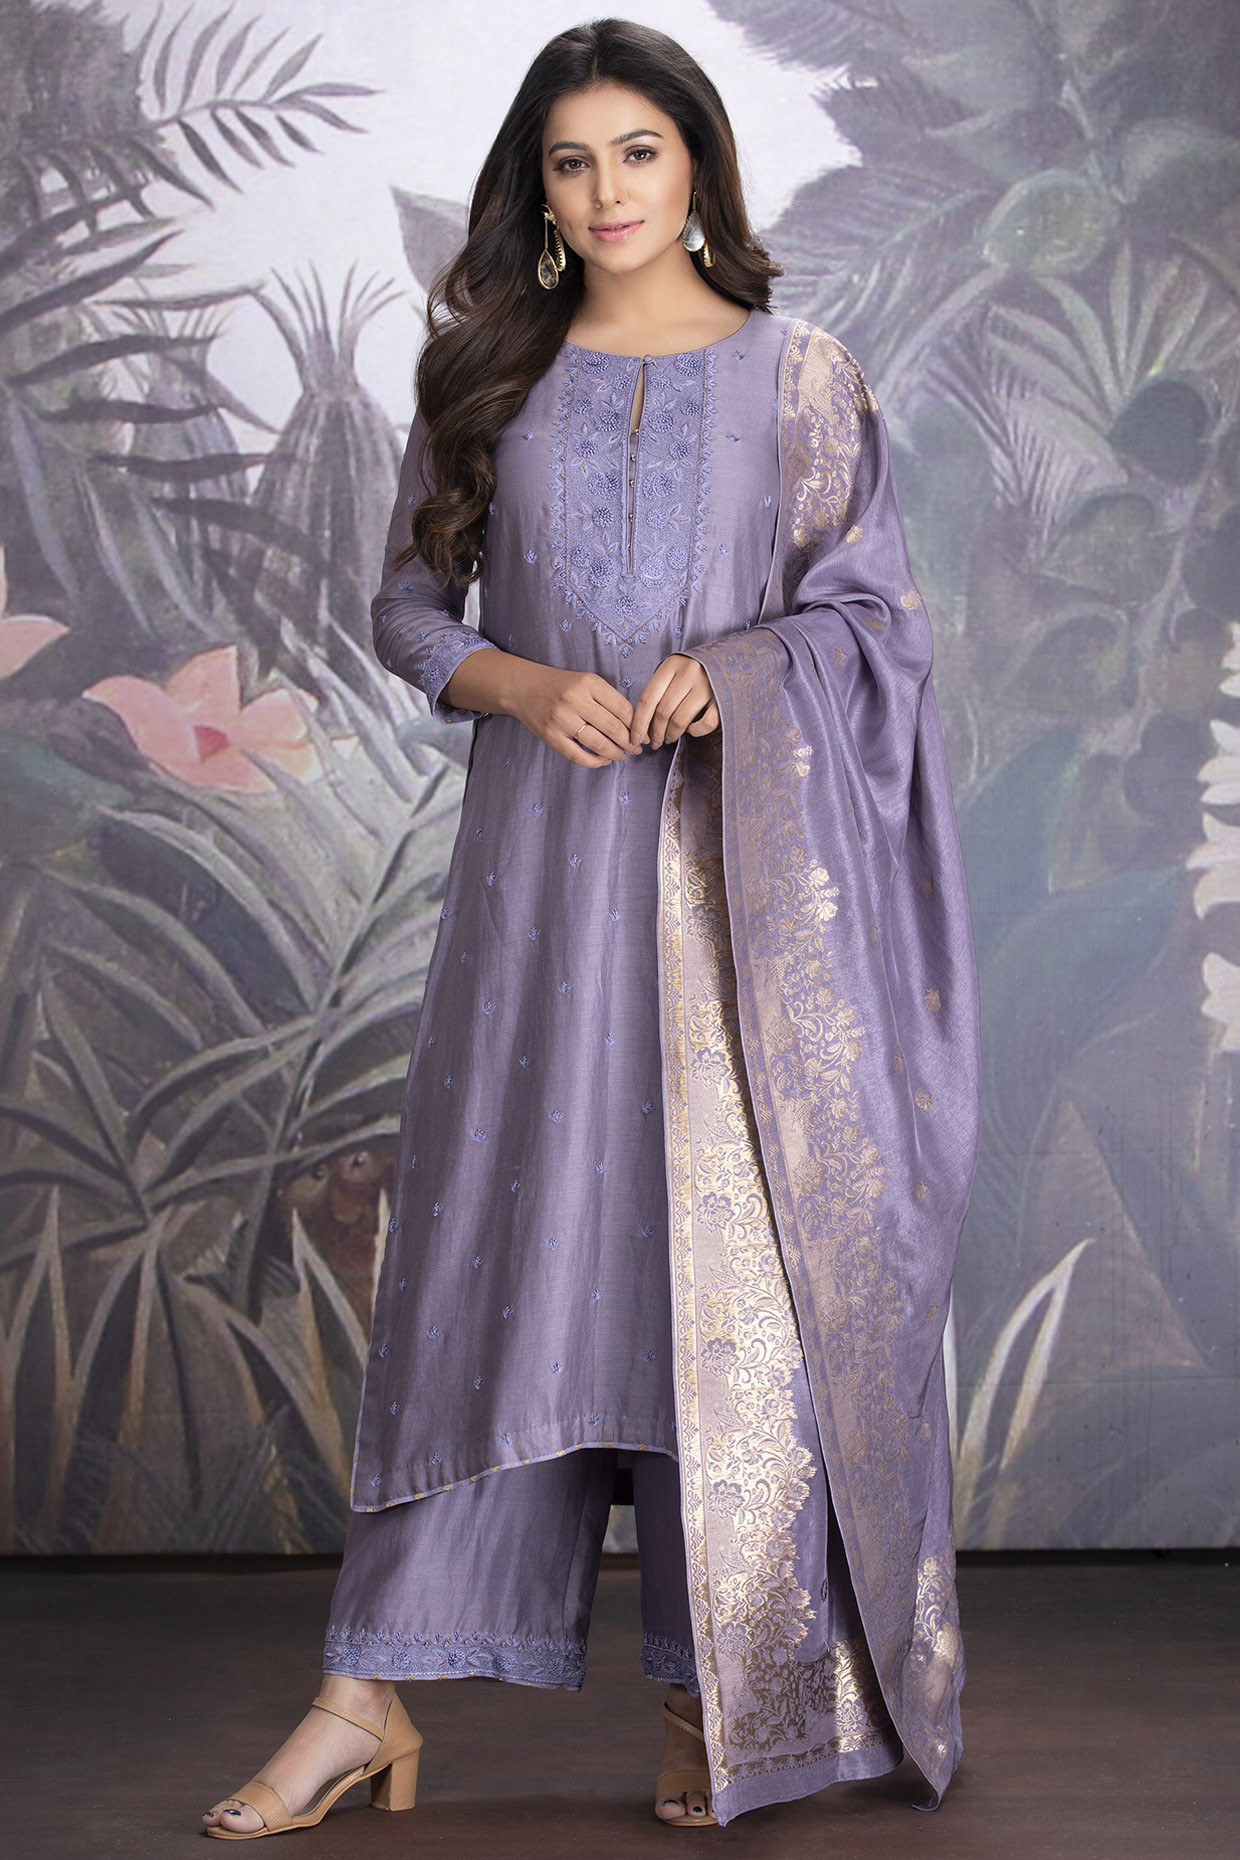 Heirloom Lilac Chanderi Silk Kurta Set With Dupatta by  House of Tushaom